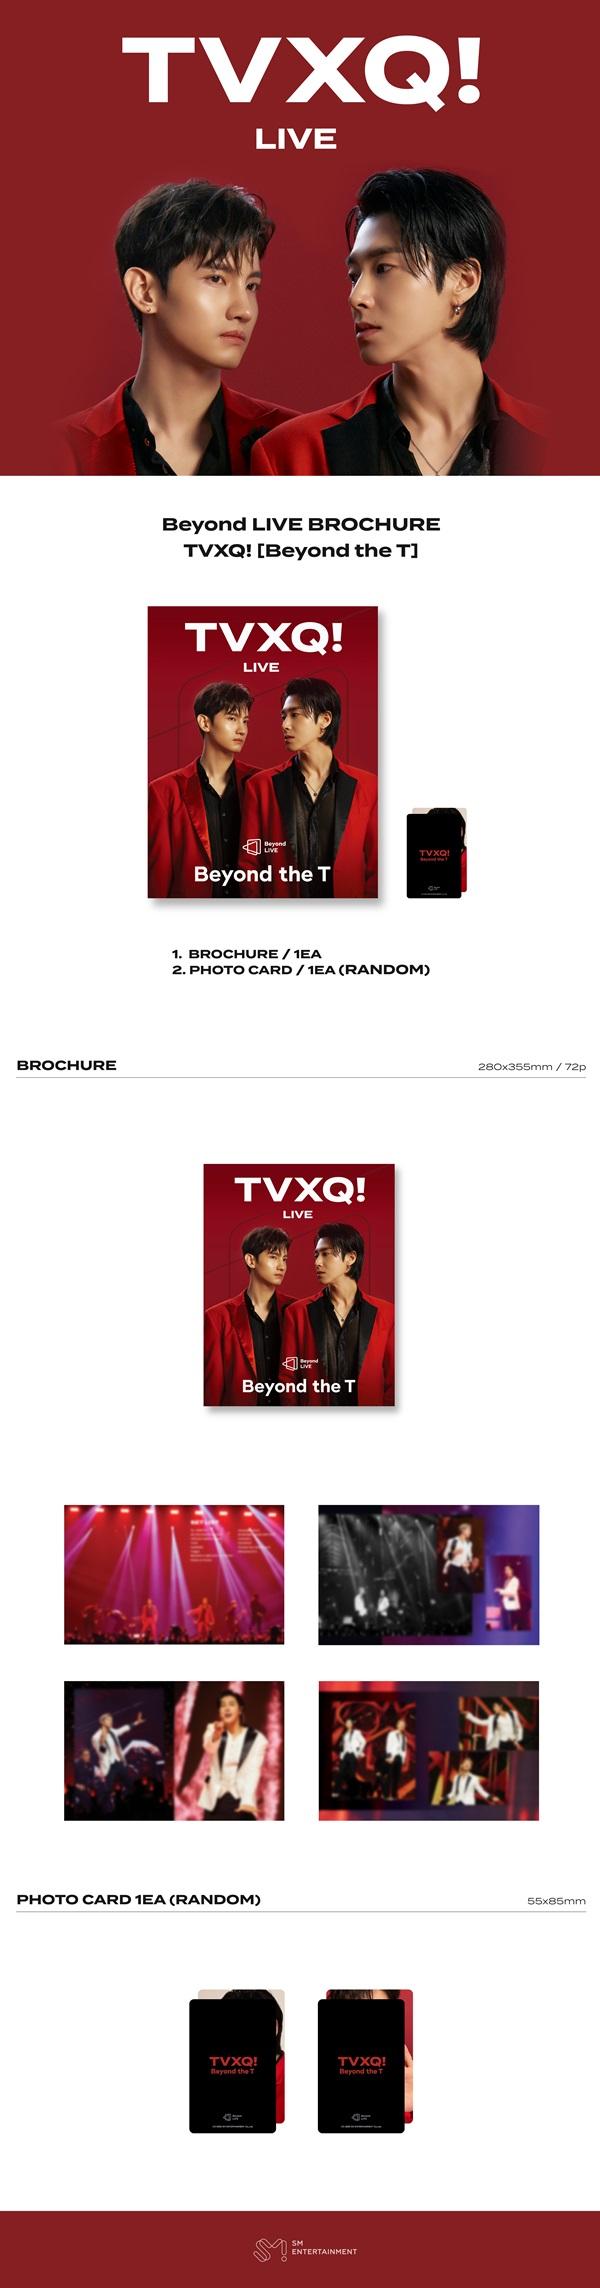 Beyond LIVE BROCHURE TVXQ! [Beyond the T]_2